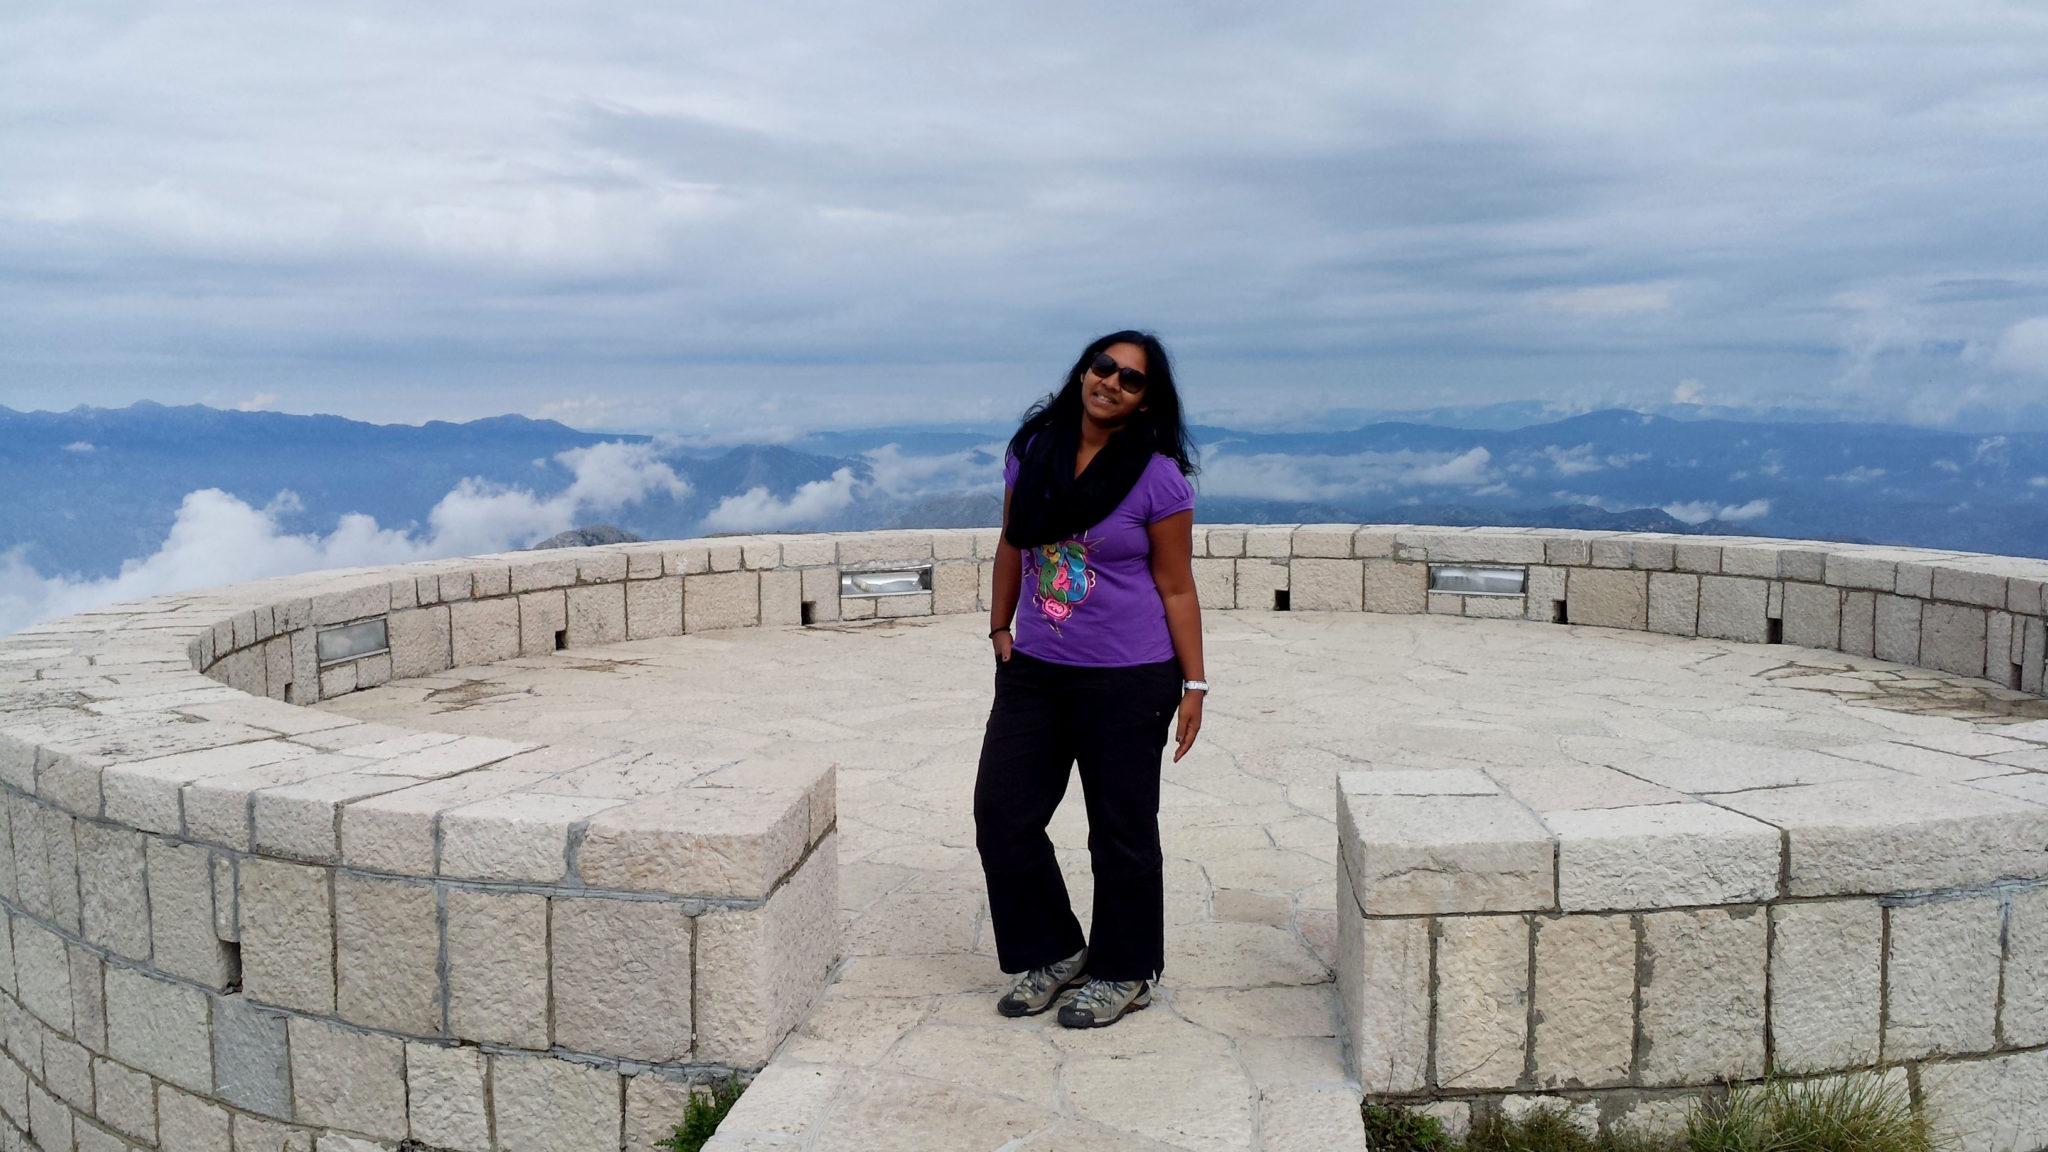 Hema_Le_parc_Lovcen_blog_voyage_travel_mausolee_nejegos14